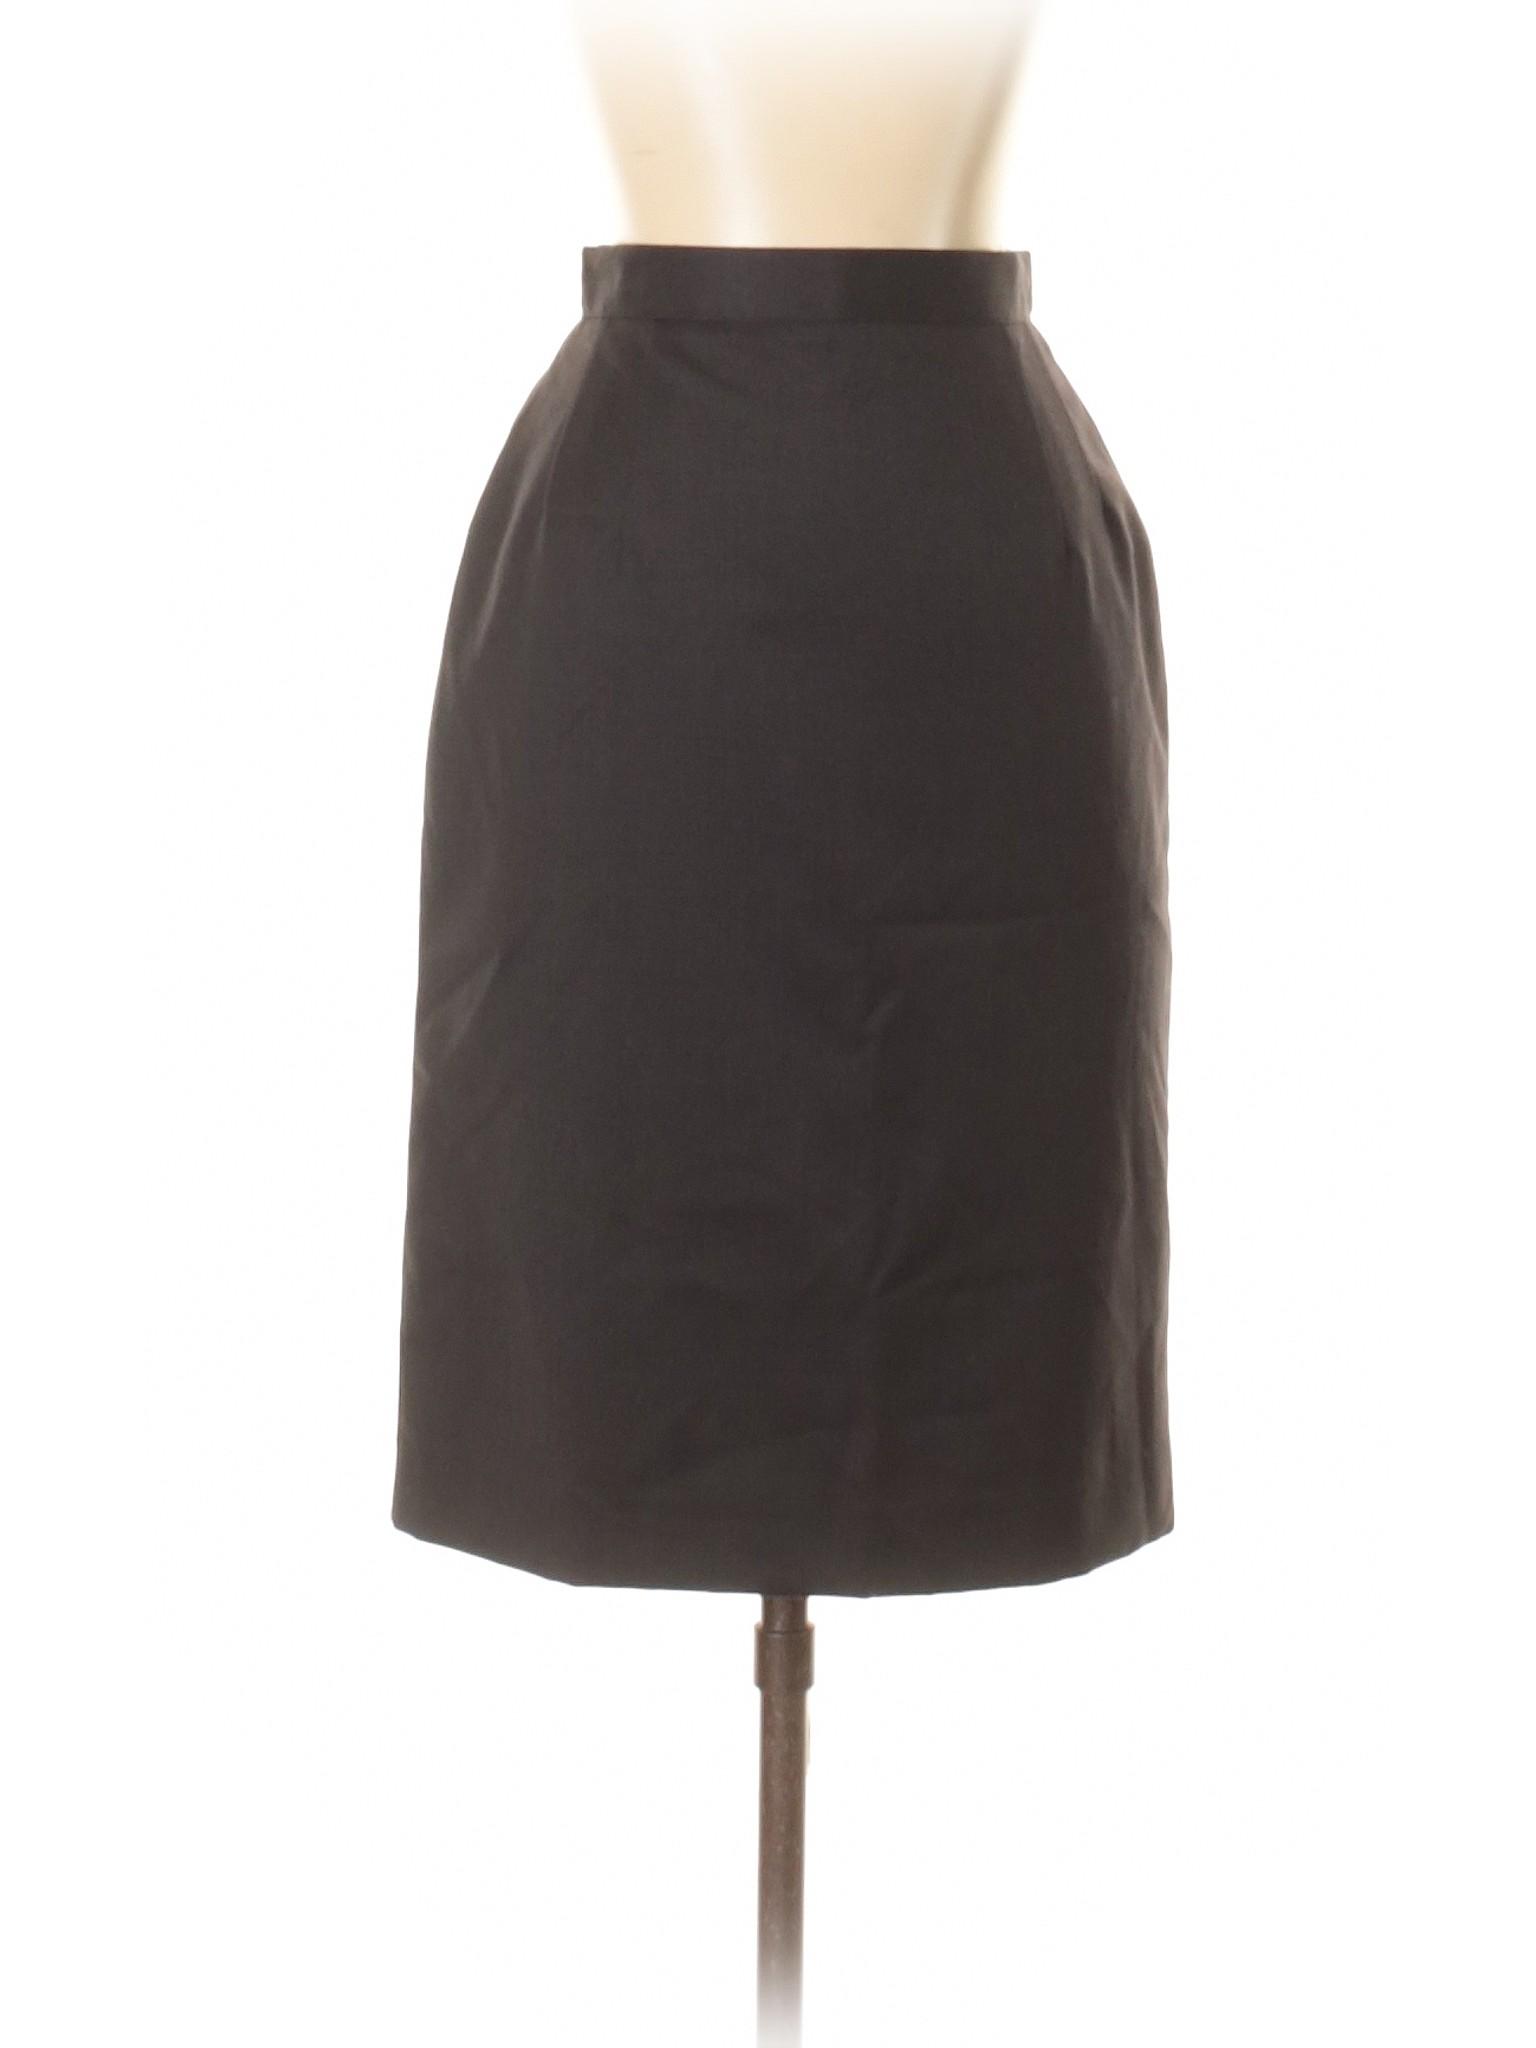 Skirt Boutique Skirt Wool Boutique Skirt Boutique Wool Boutique Wool Wool Yxq7a0w